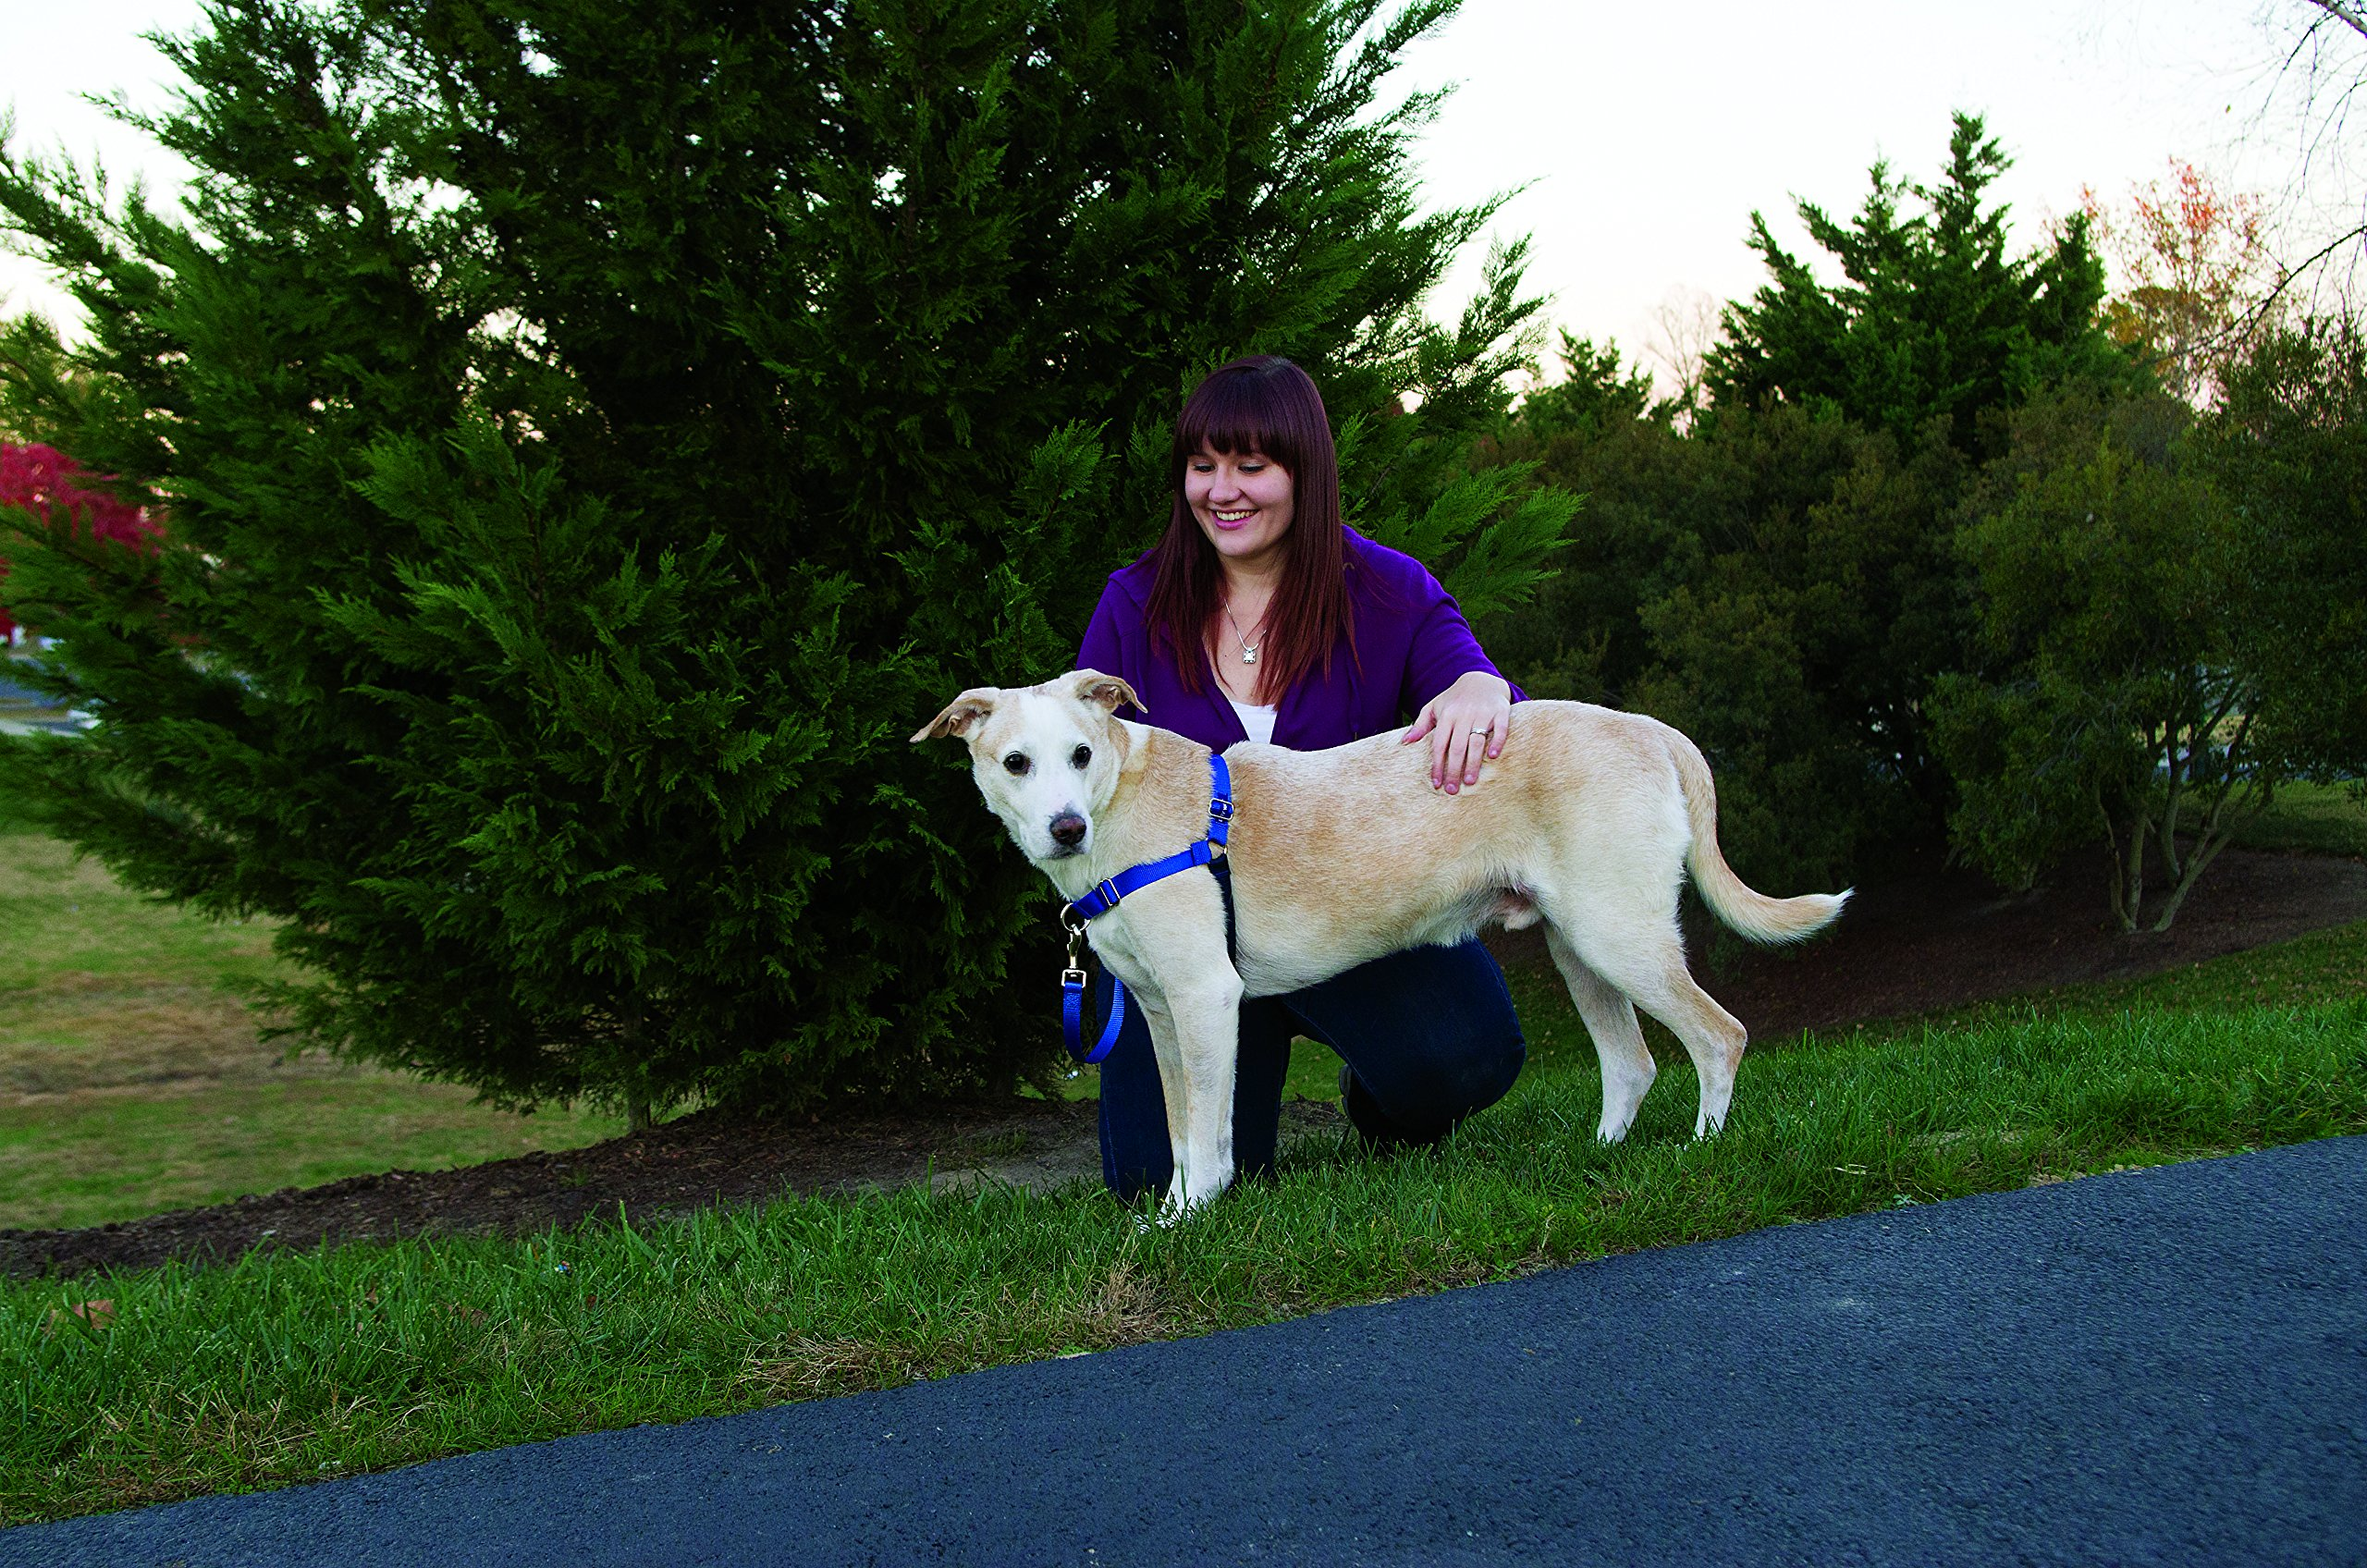 PetSafe Easy Walk Harness, Medium/Large, BLACK/SILVER for Dogs by PetSafe (Image #7)